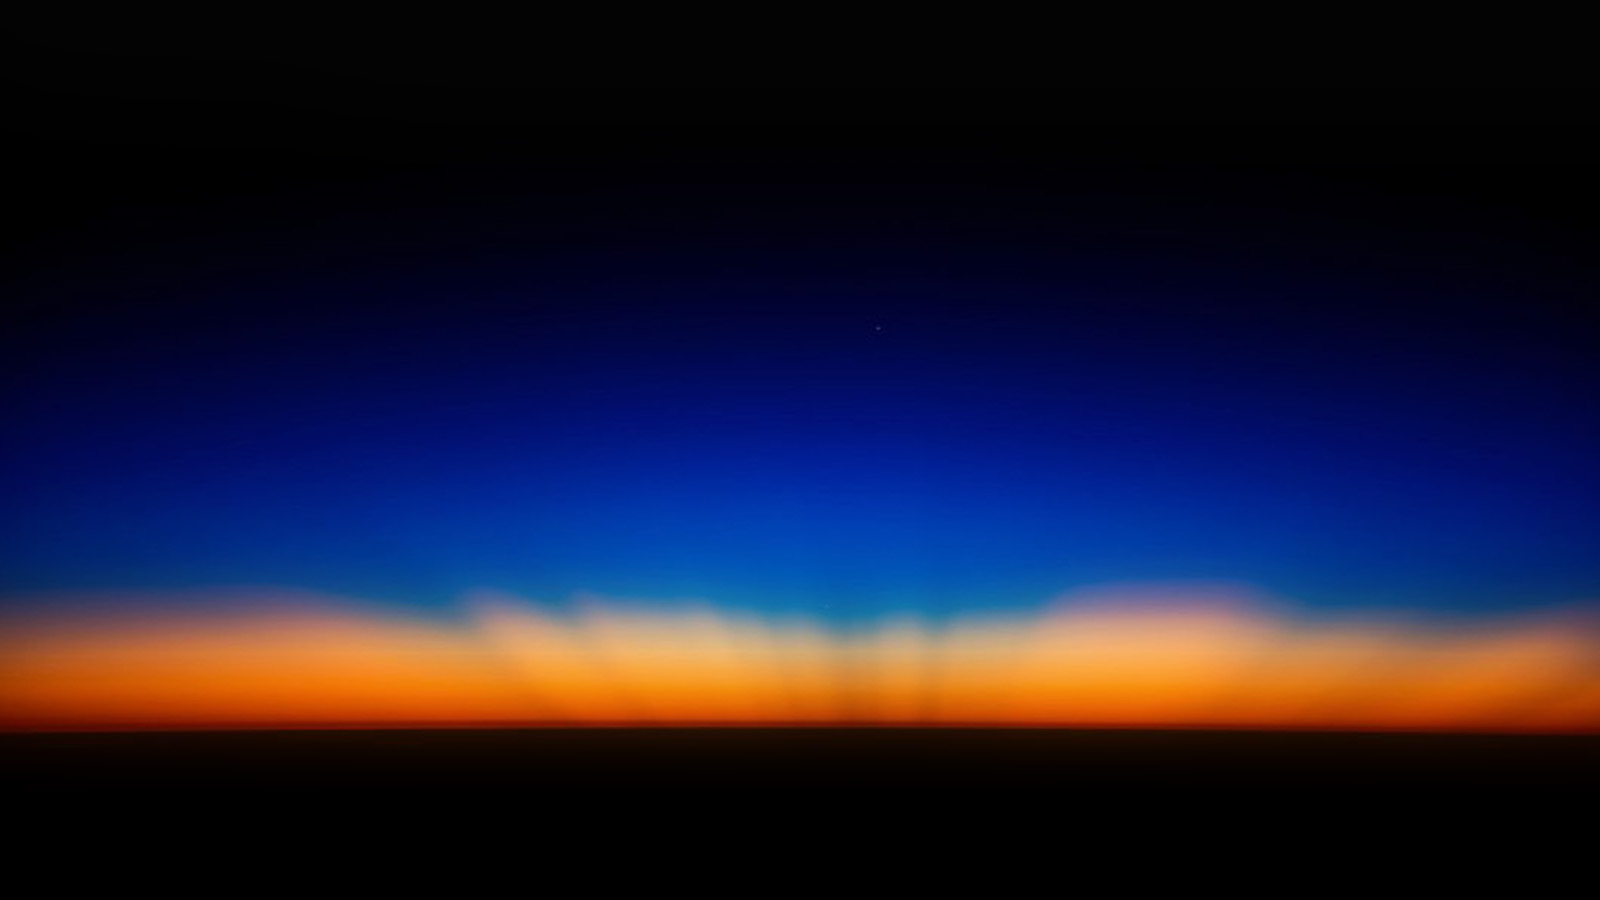 Fall Wallpaper For Iphone 7 Plus Sk35 Sunset Dark Red Blue Horizontal Blur Gradation Wallpaper